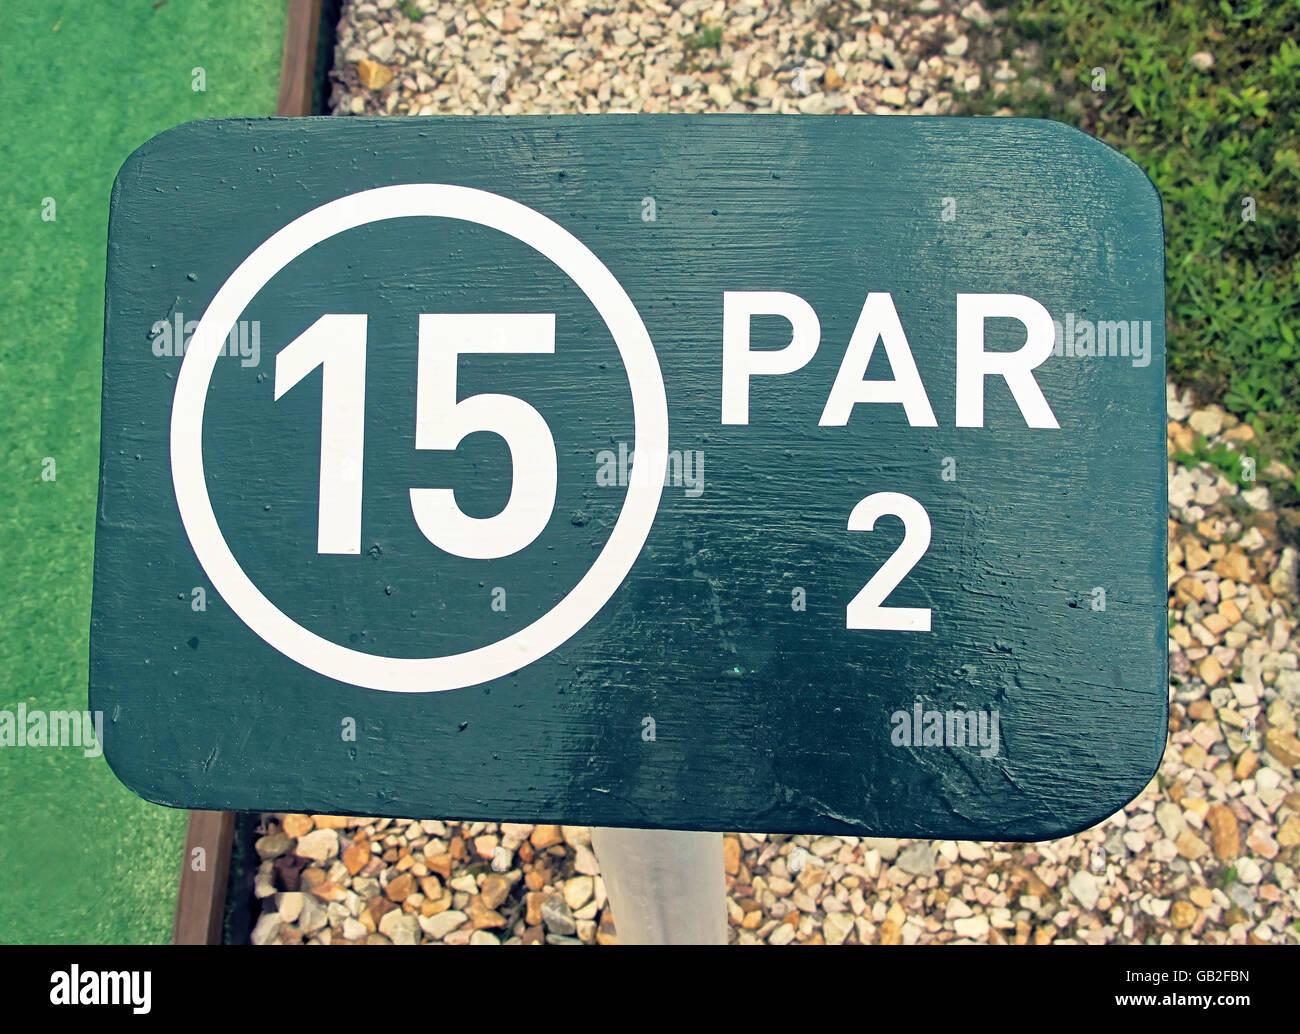 Mini golf course green sign Par 2 hole 15. - Stock Image